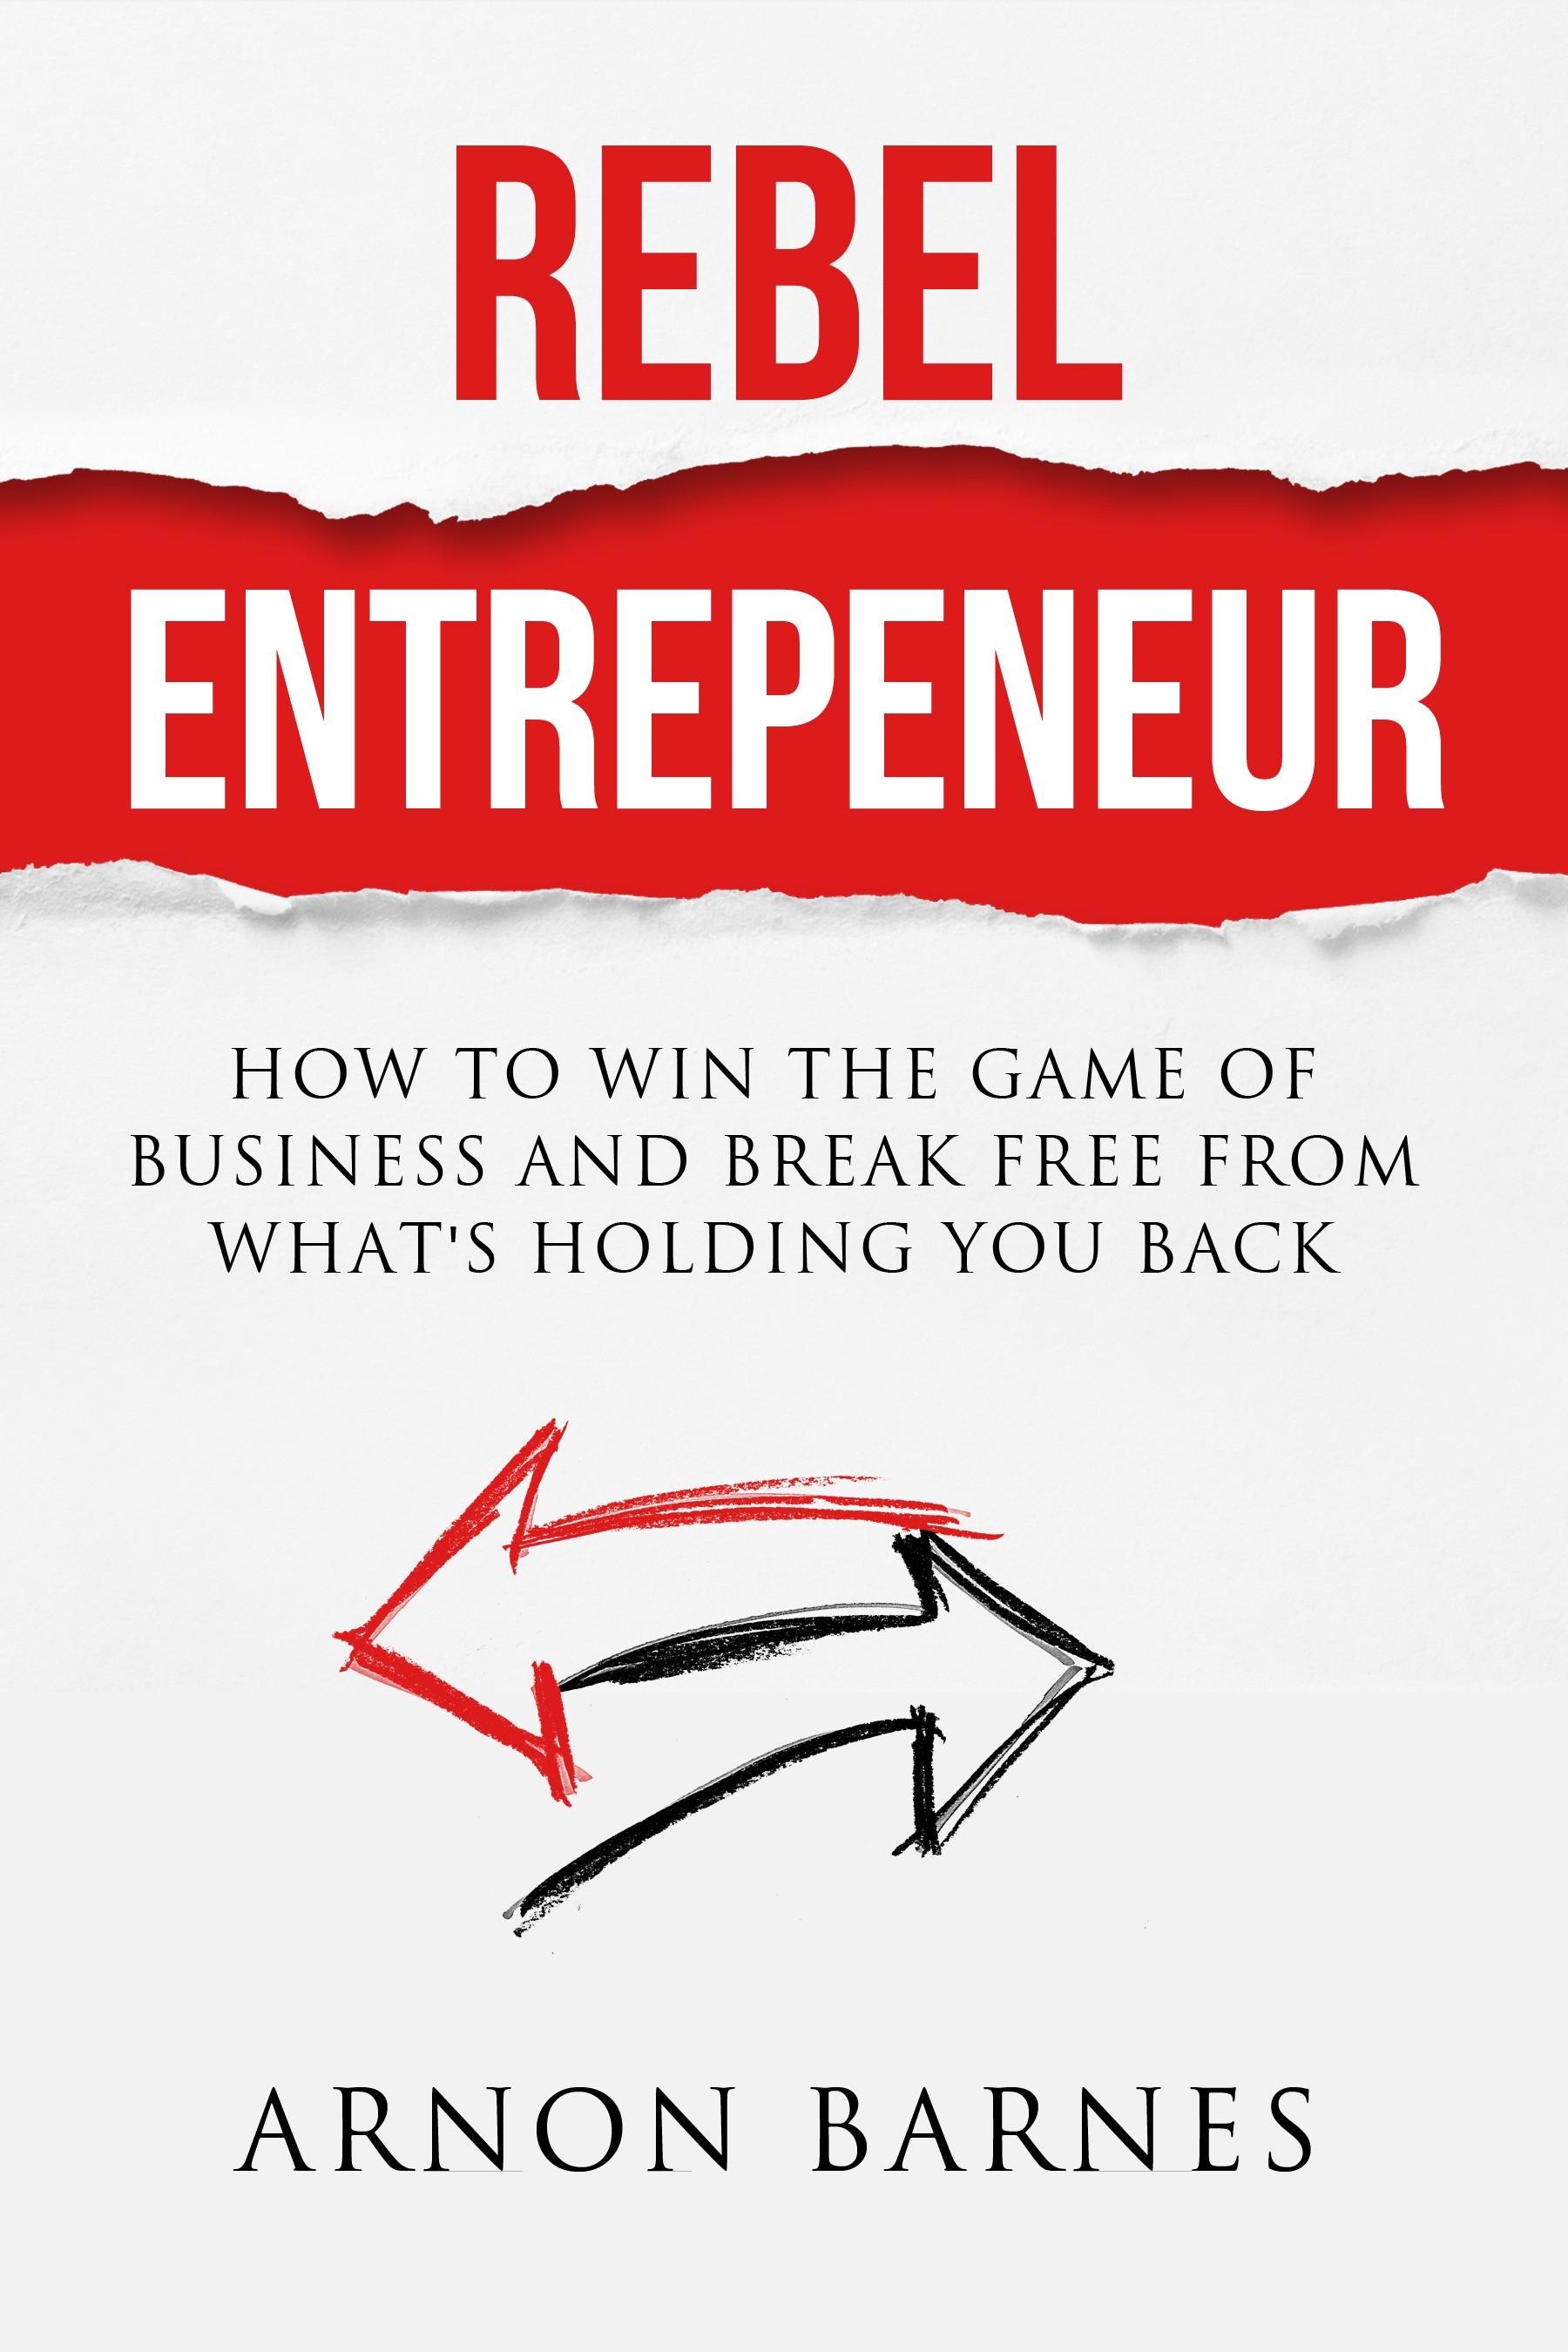 Entrepreneurs, Entrepreneurs, and Rebels